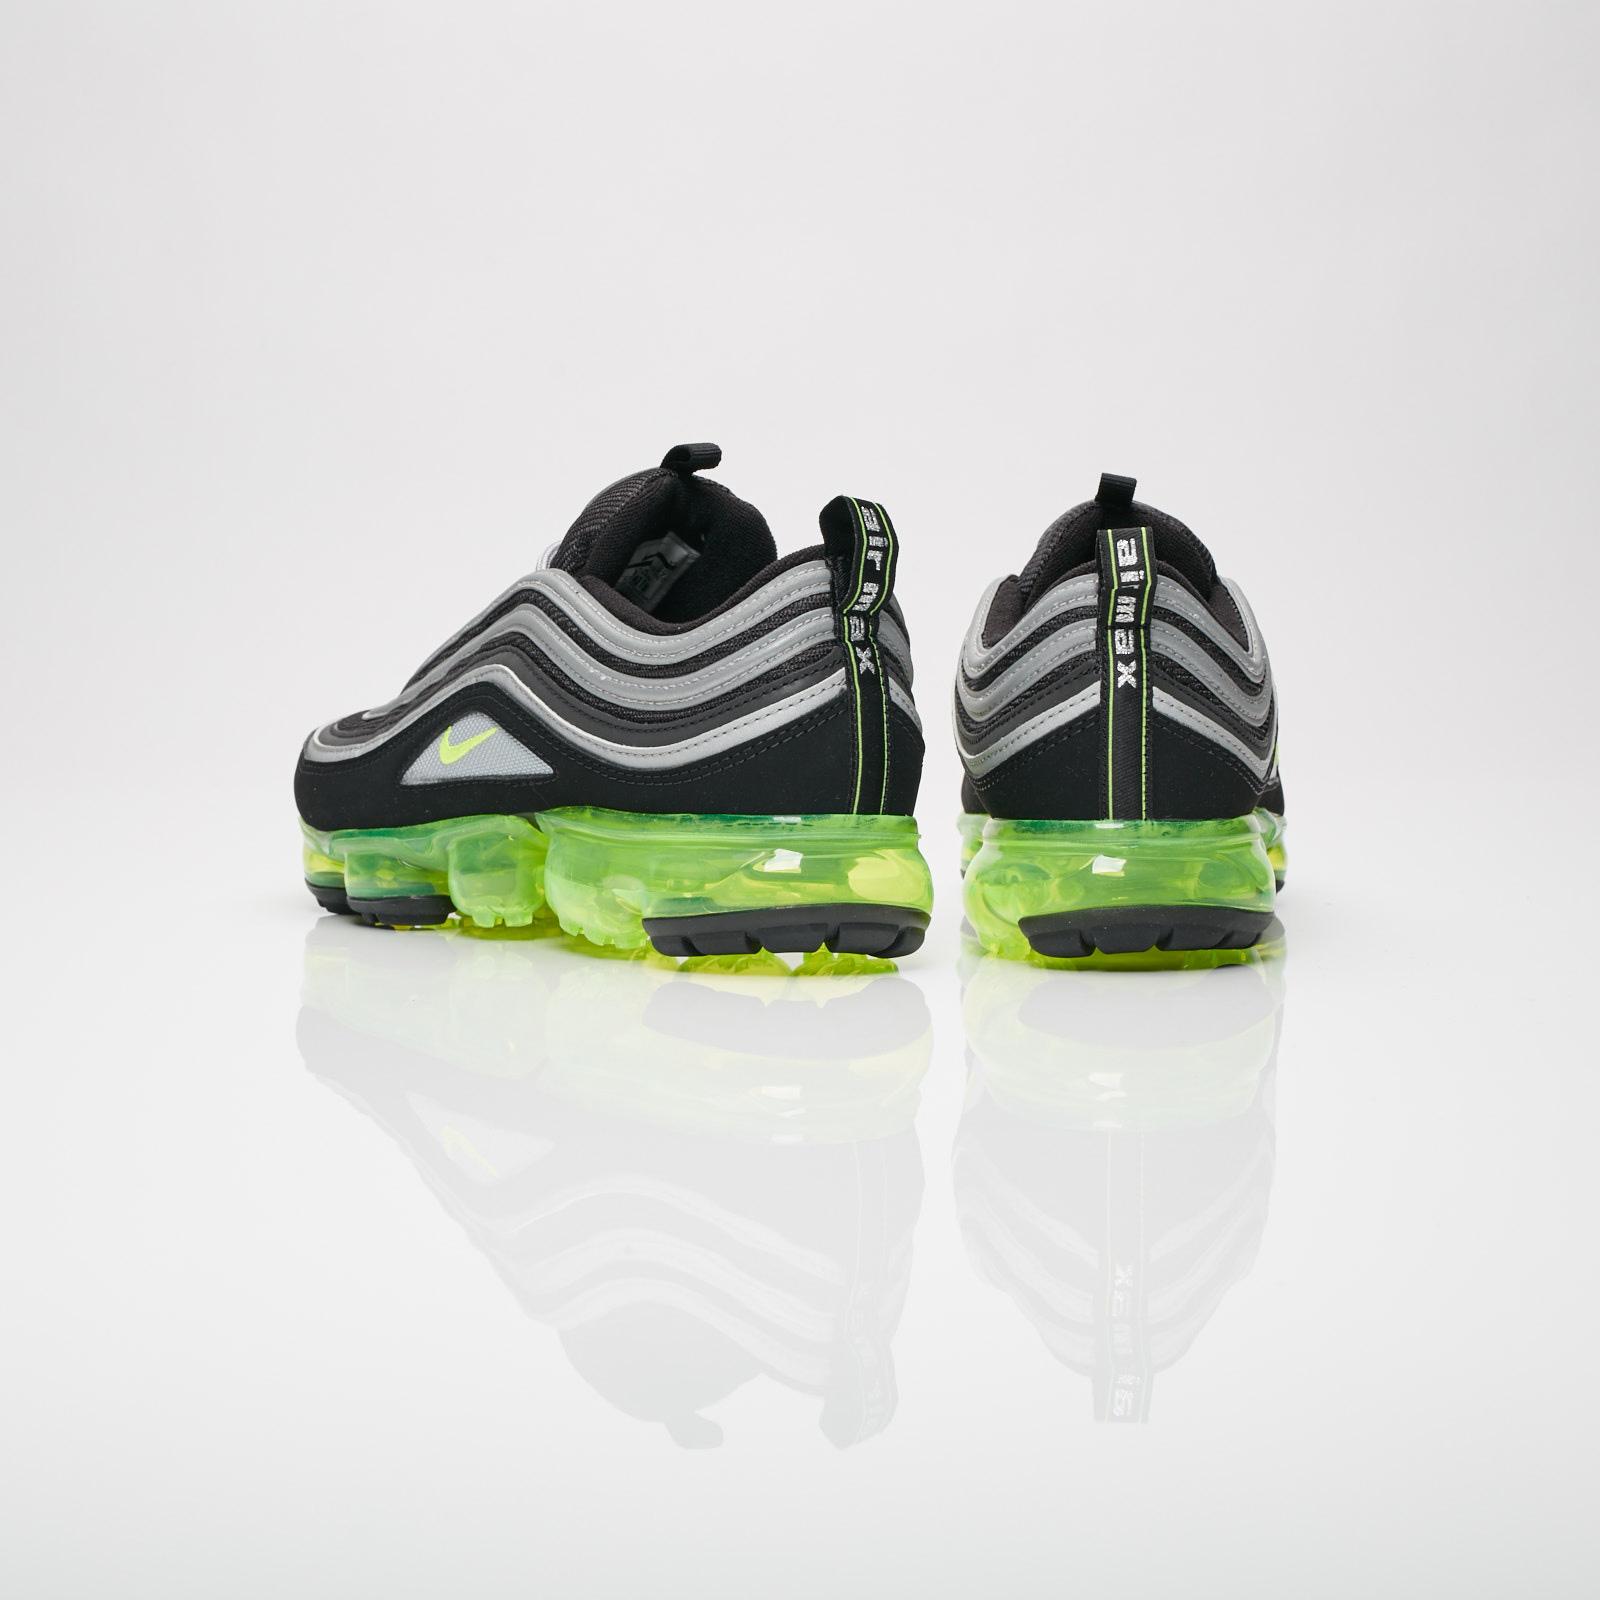 71cc524ac83 Nike Running Air VaporMax 97 Nike Running Air VaporMax 97 ...